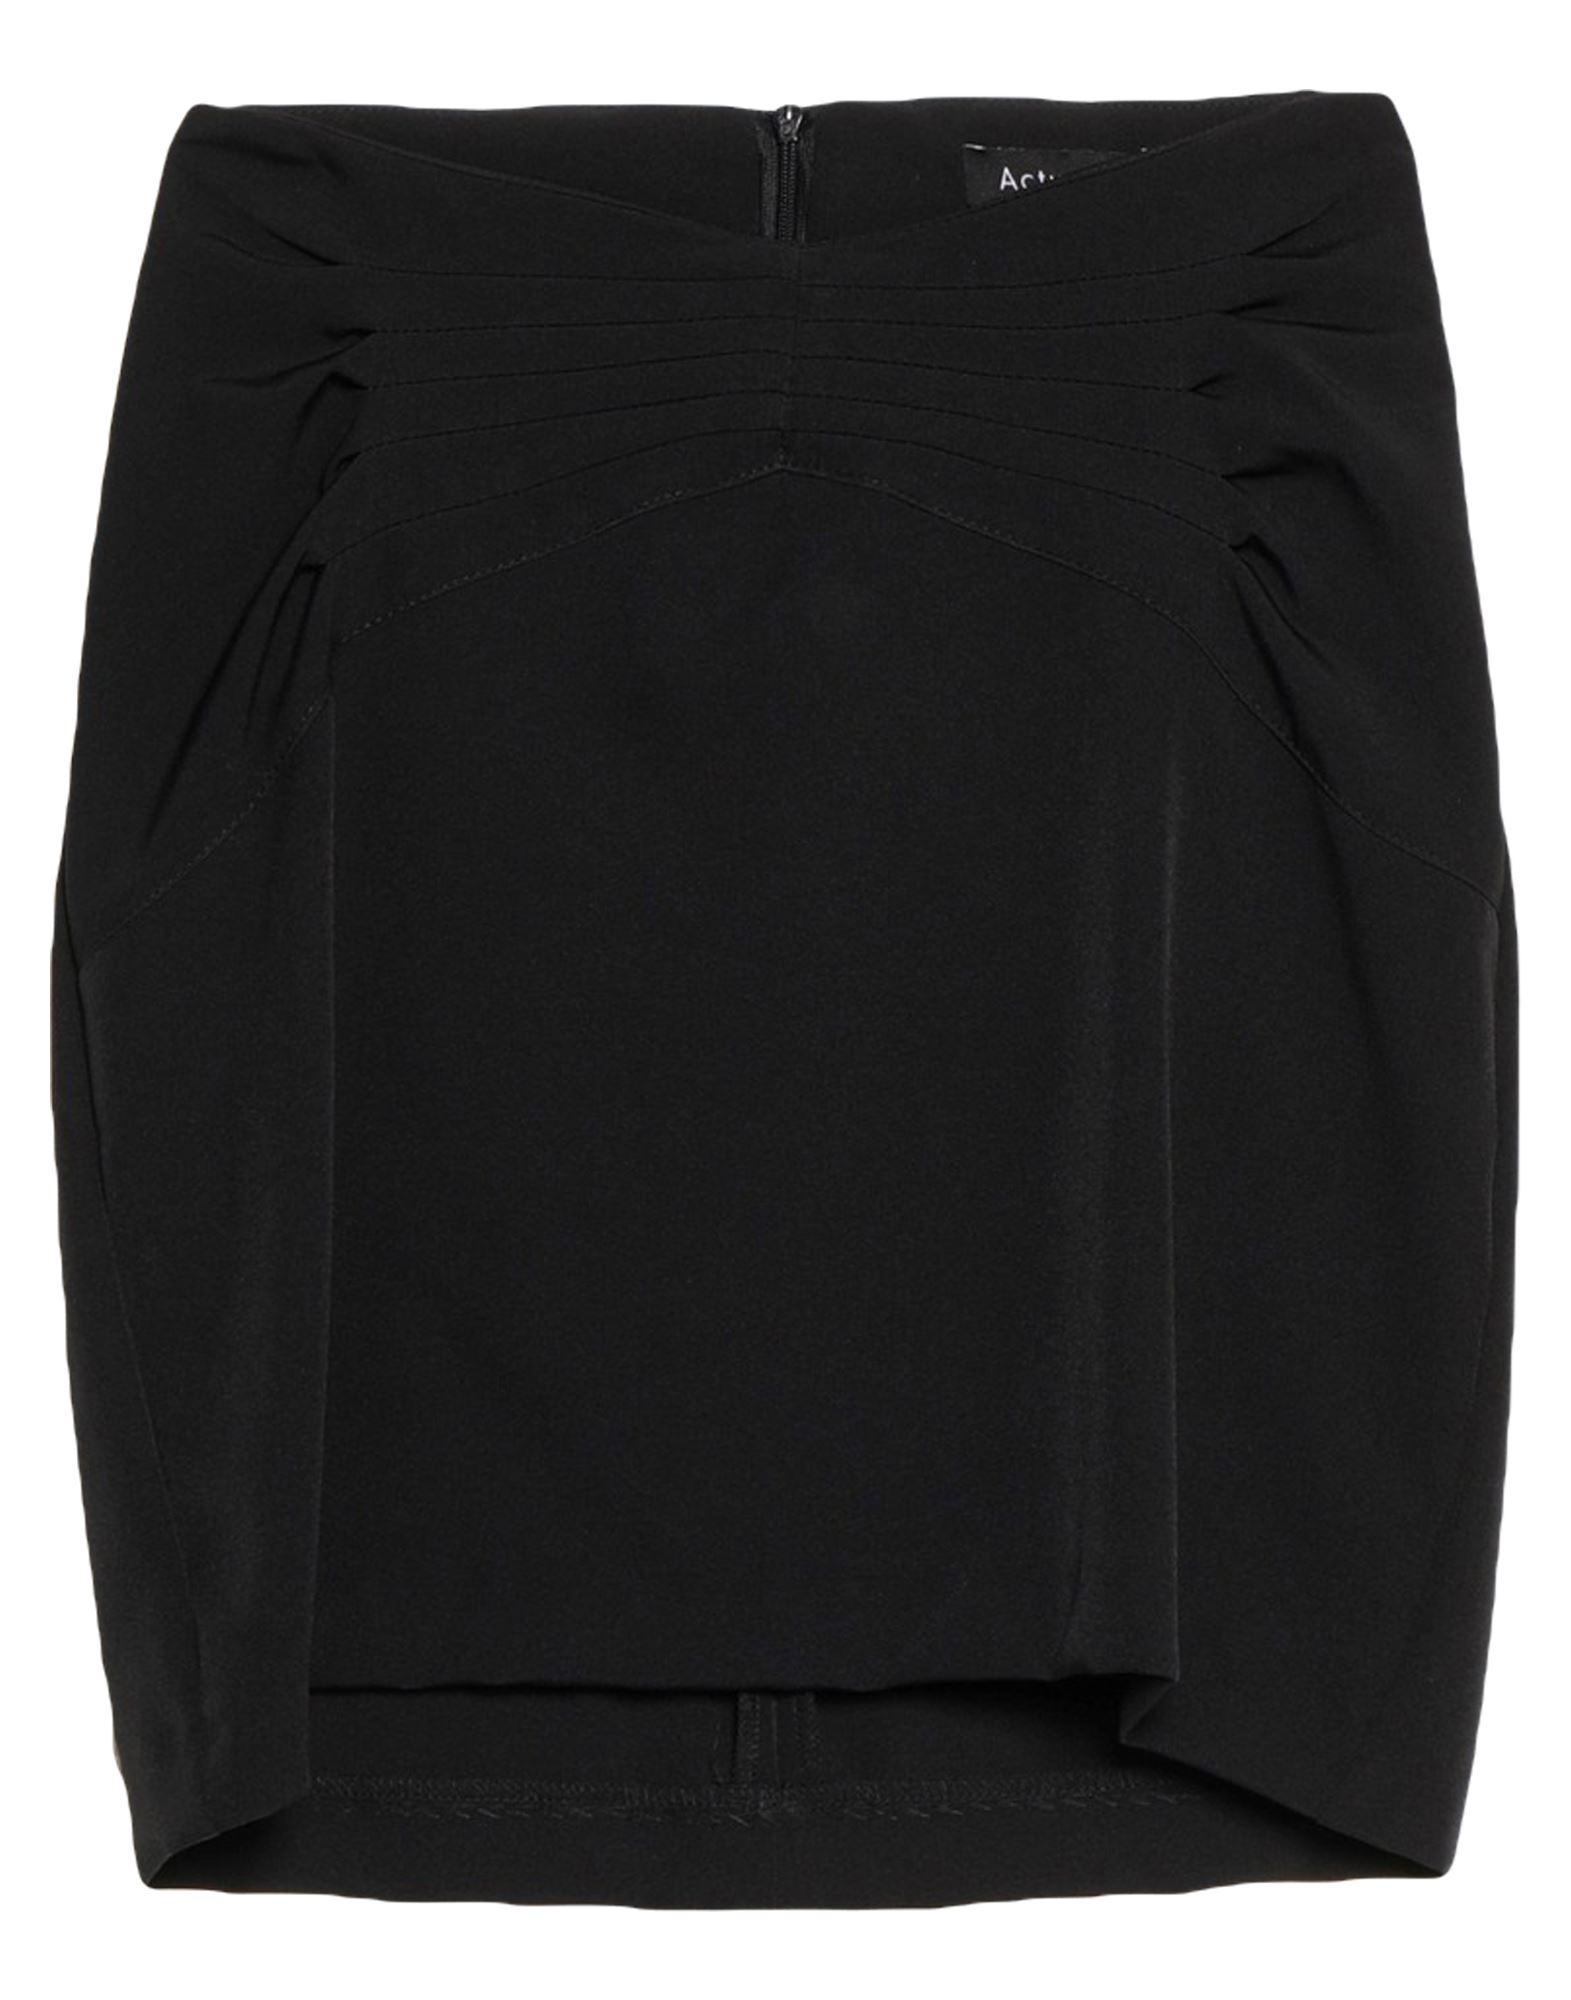 Actualee Mini Skirts In Black